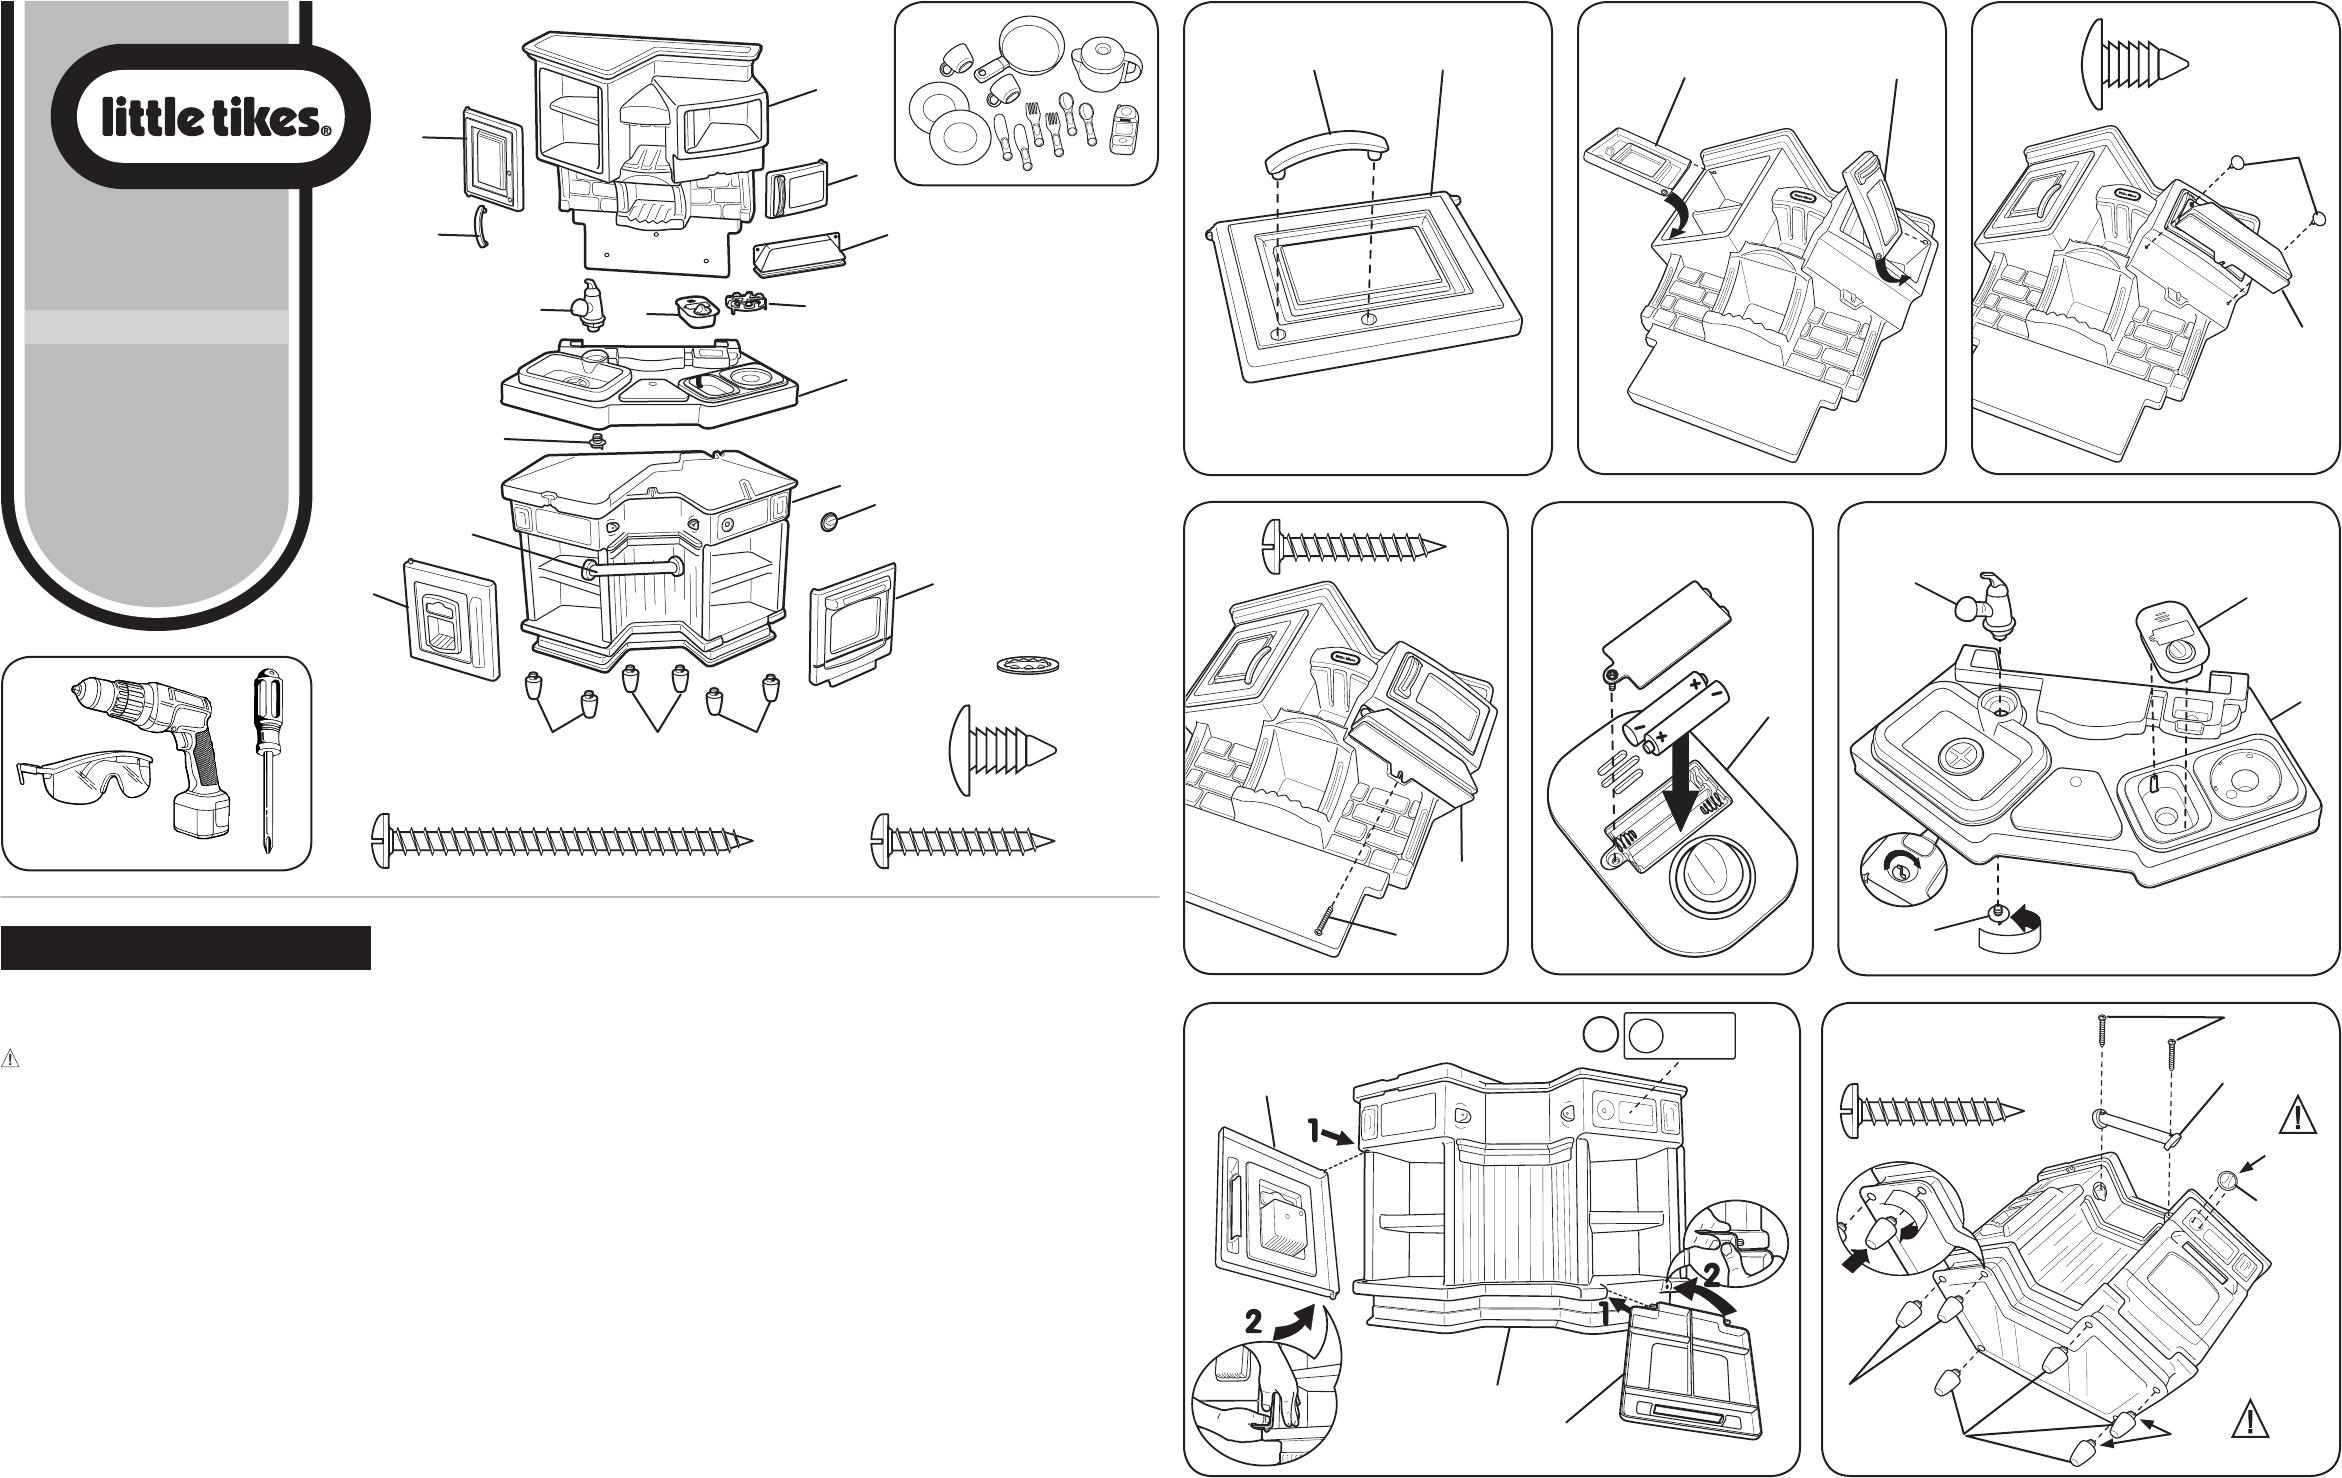 Little Tikes Super Chef Kitchen Manual